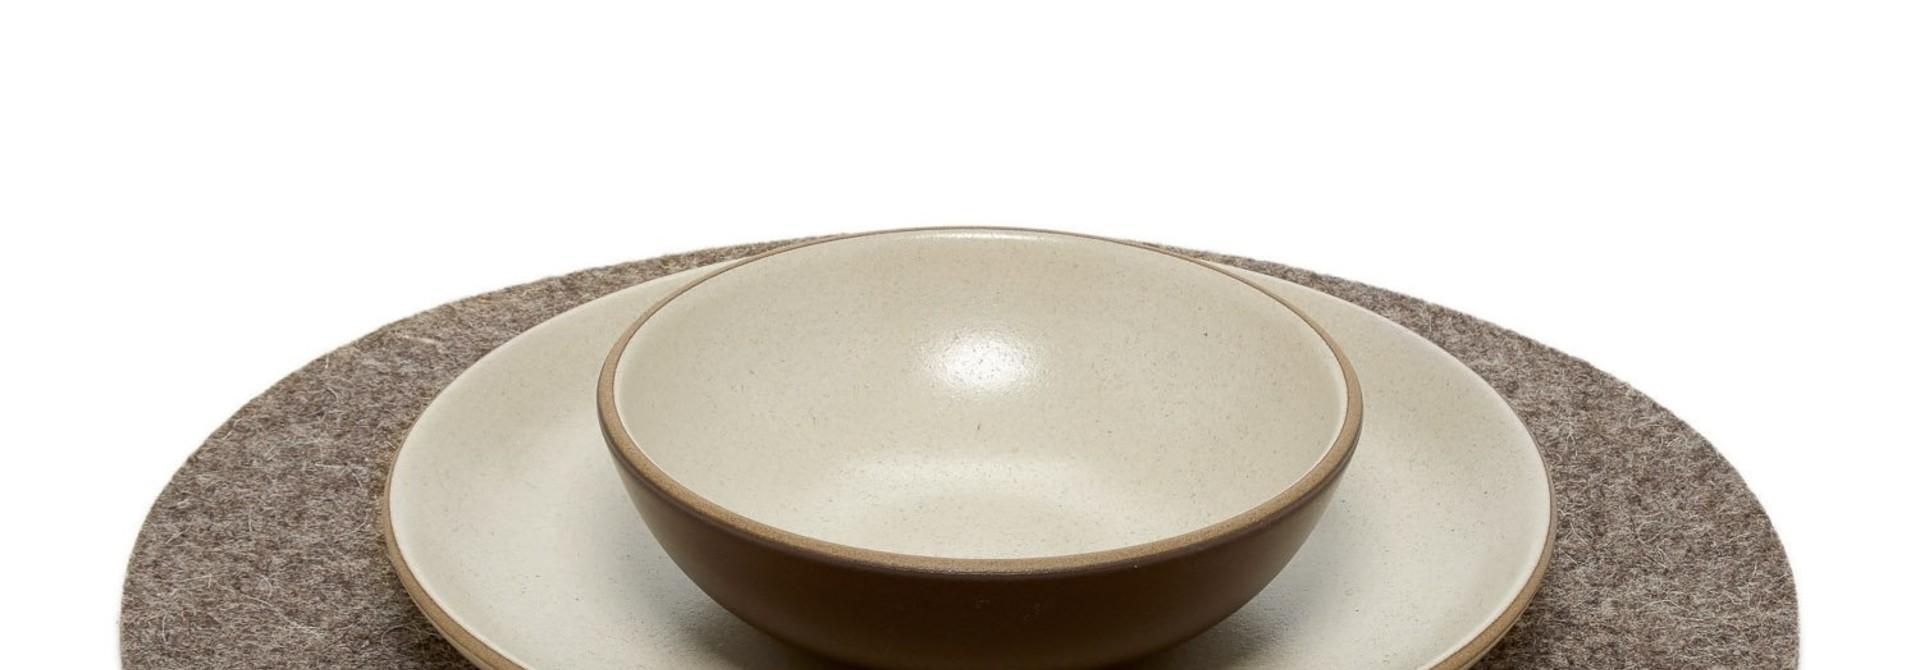 Felt Placemat - Round - Ash Brown